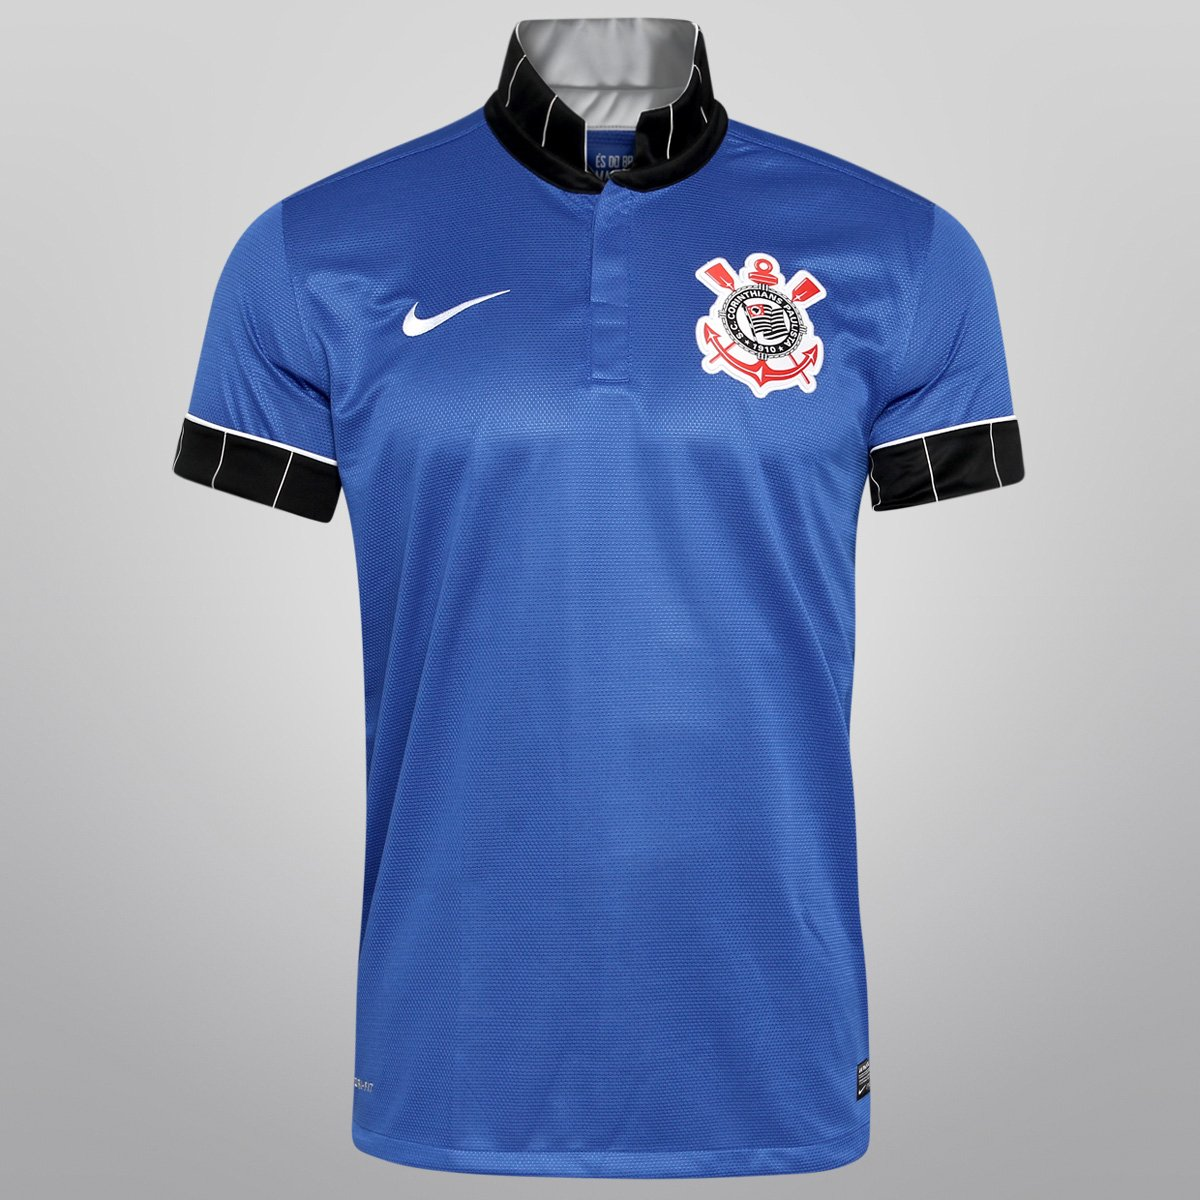 Camisa Nike Corinthians III 13 14 s nº - Compre Agora  a4e5dff394c3b